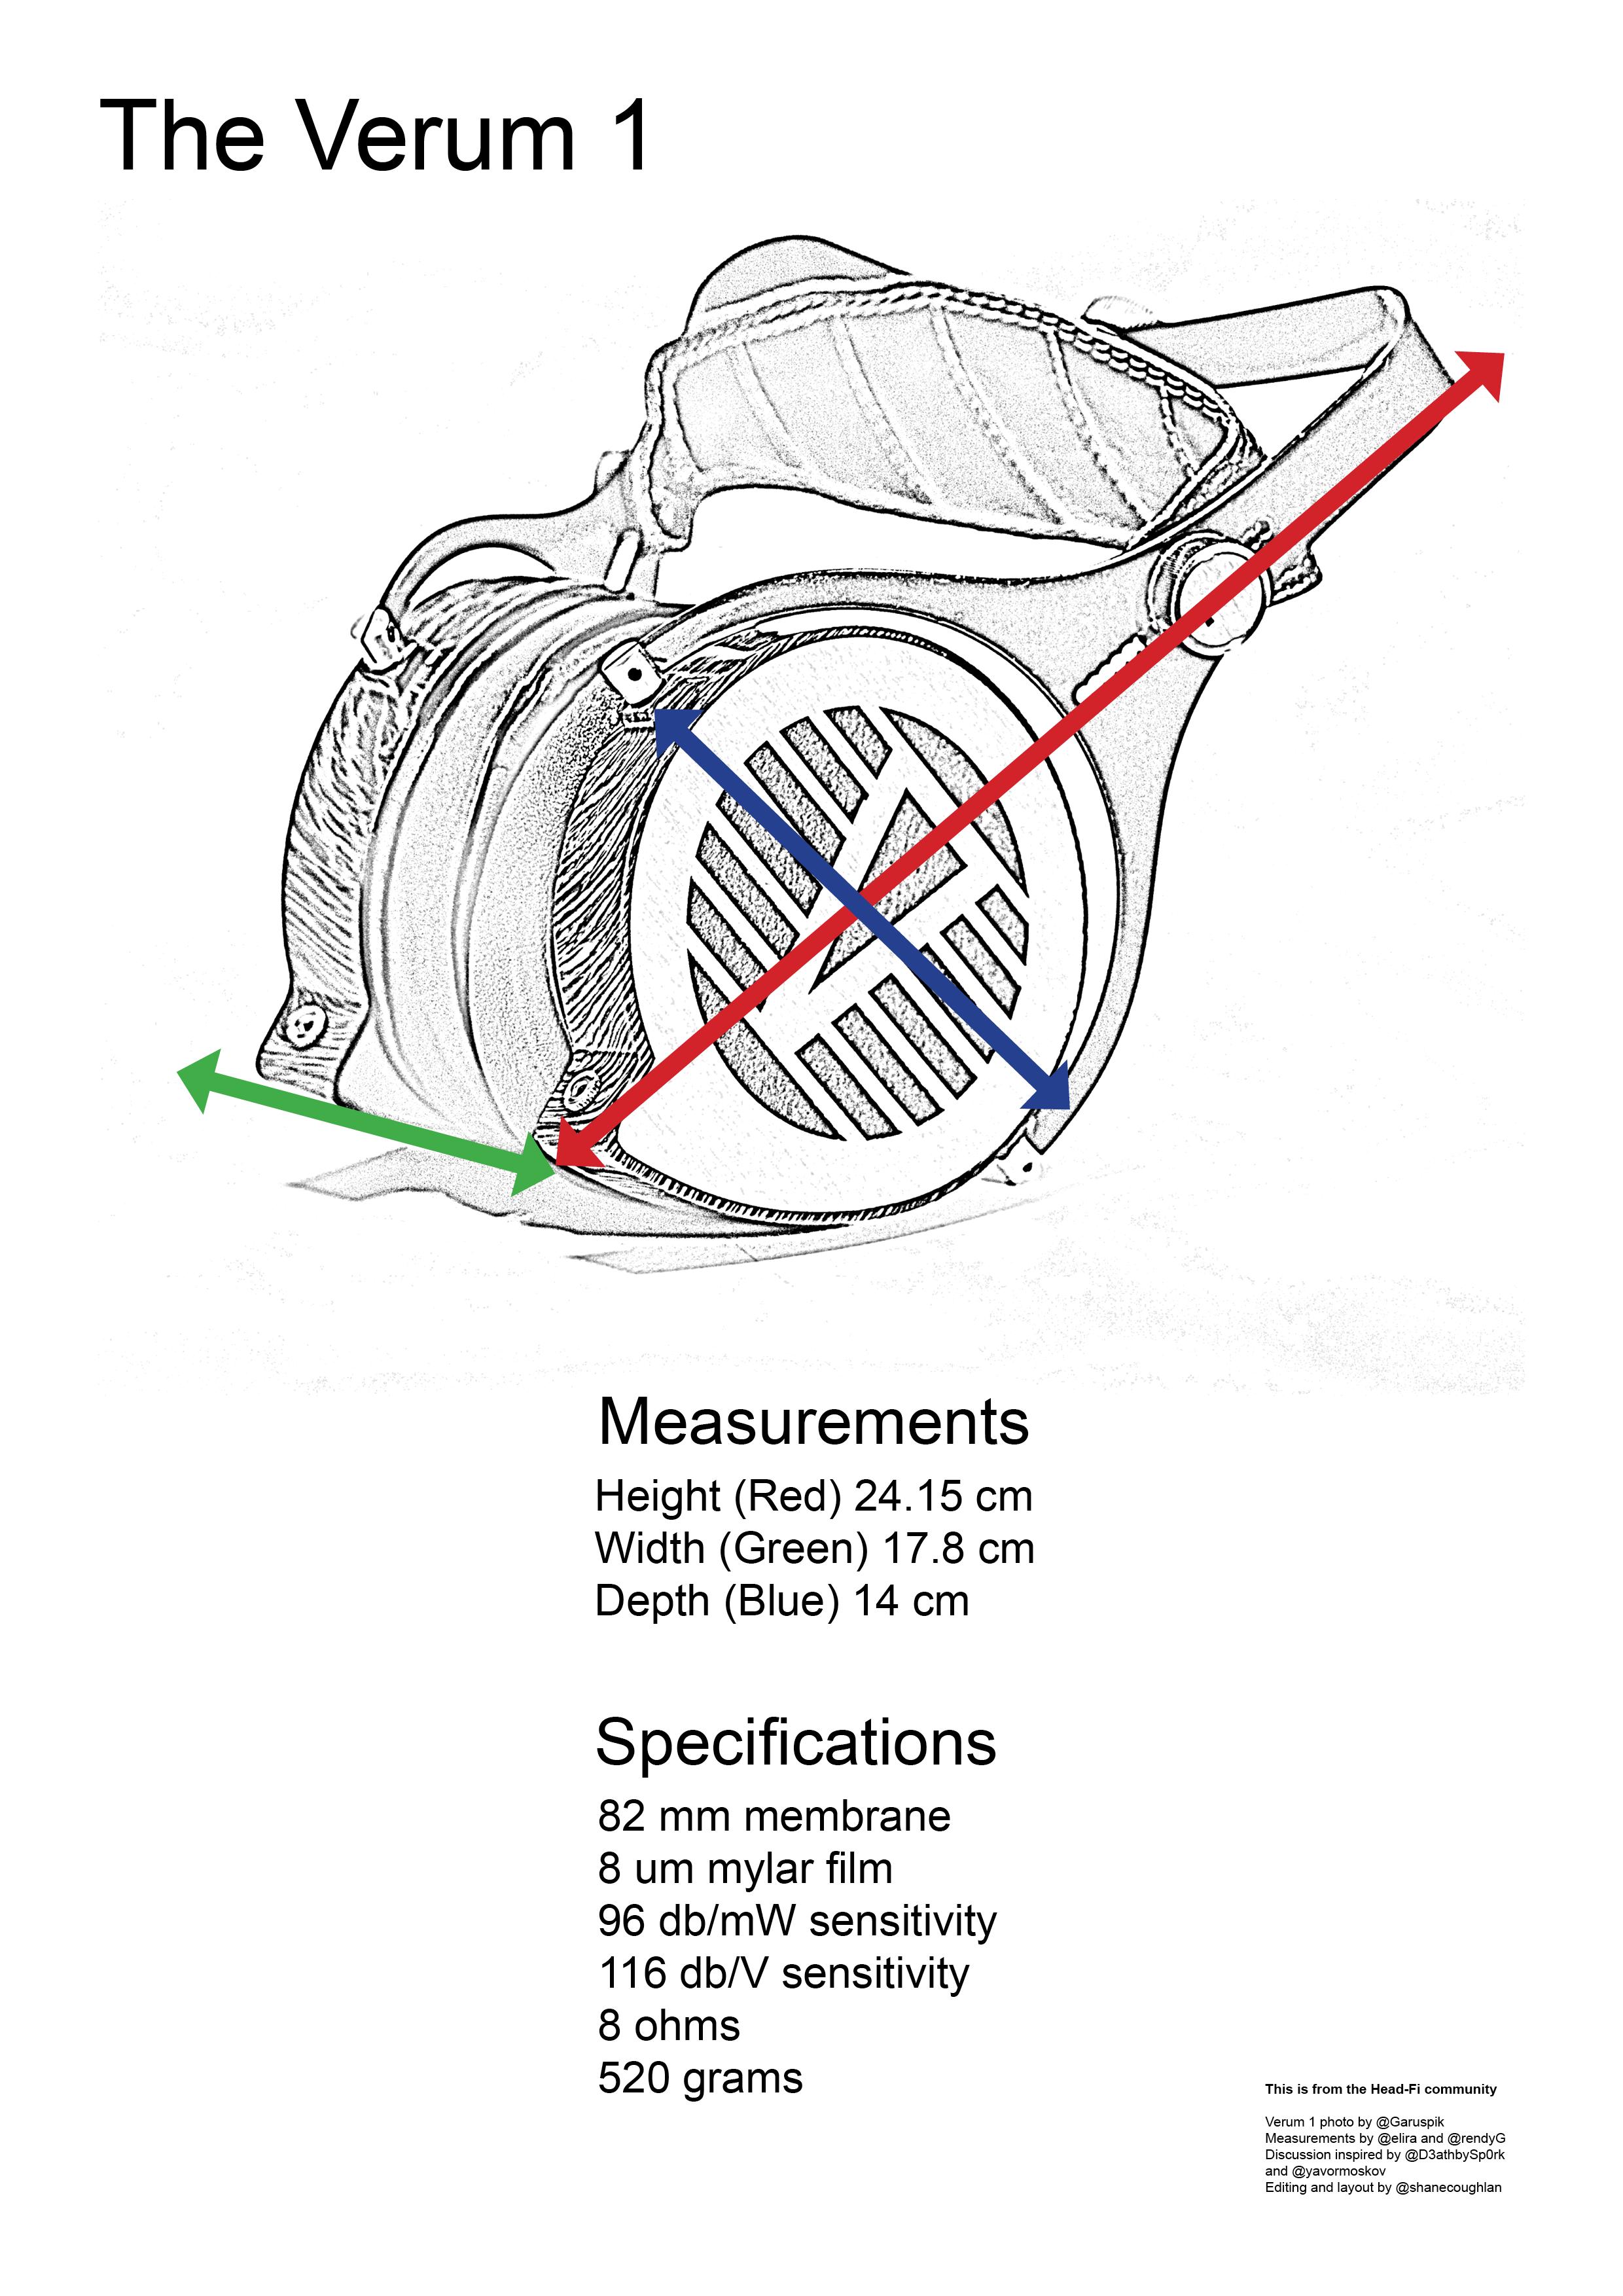 Verum-One-Measurements.png